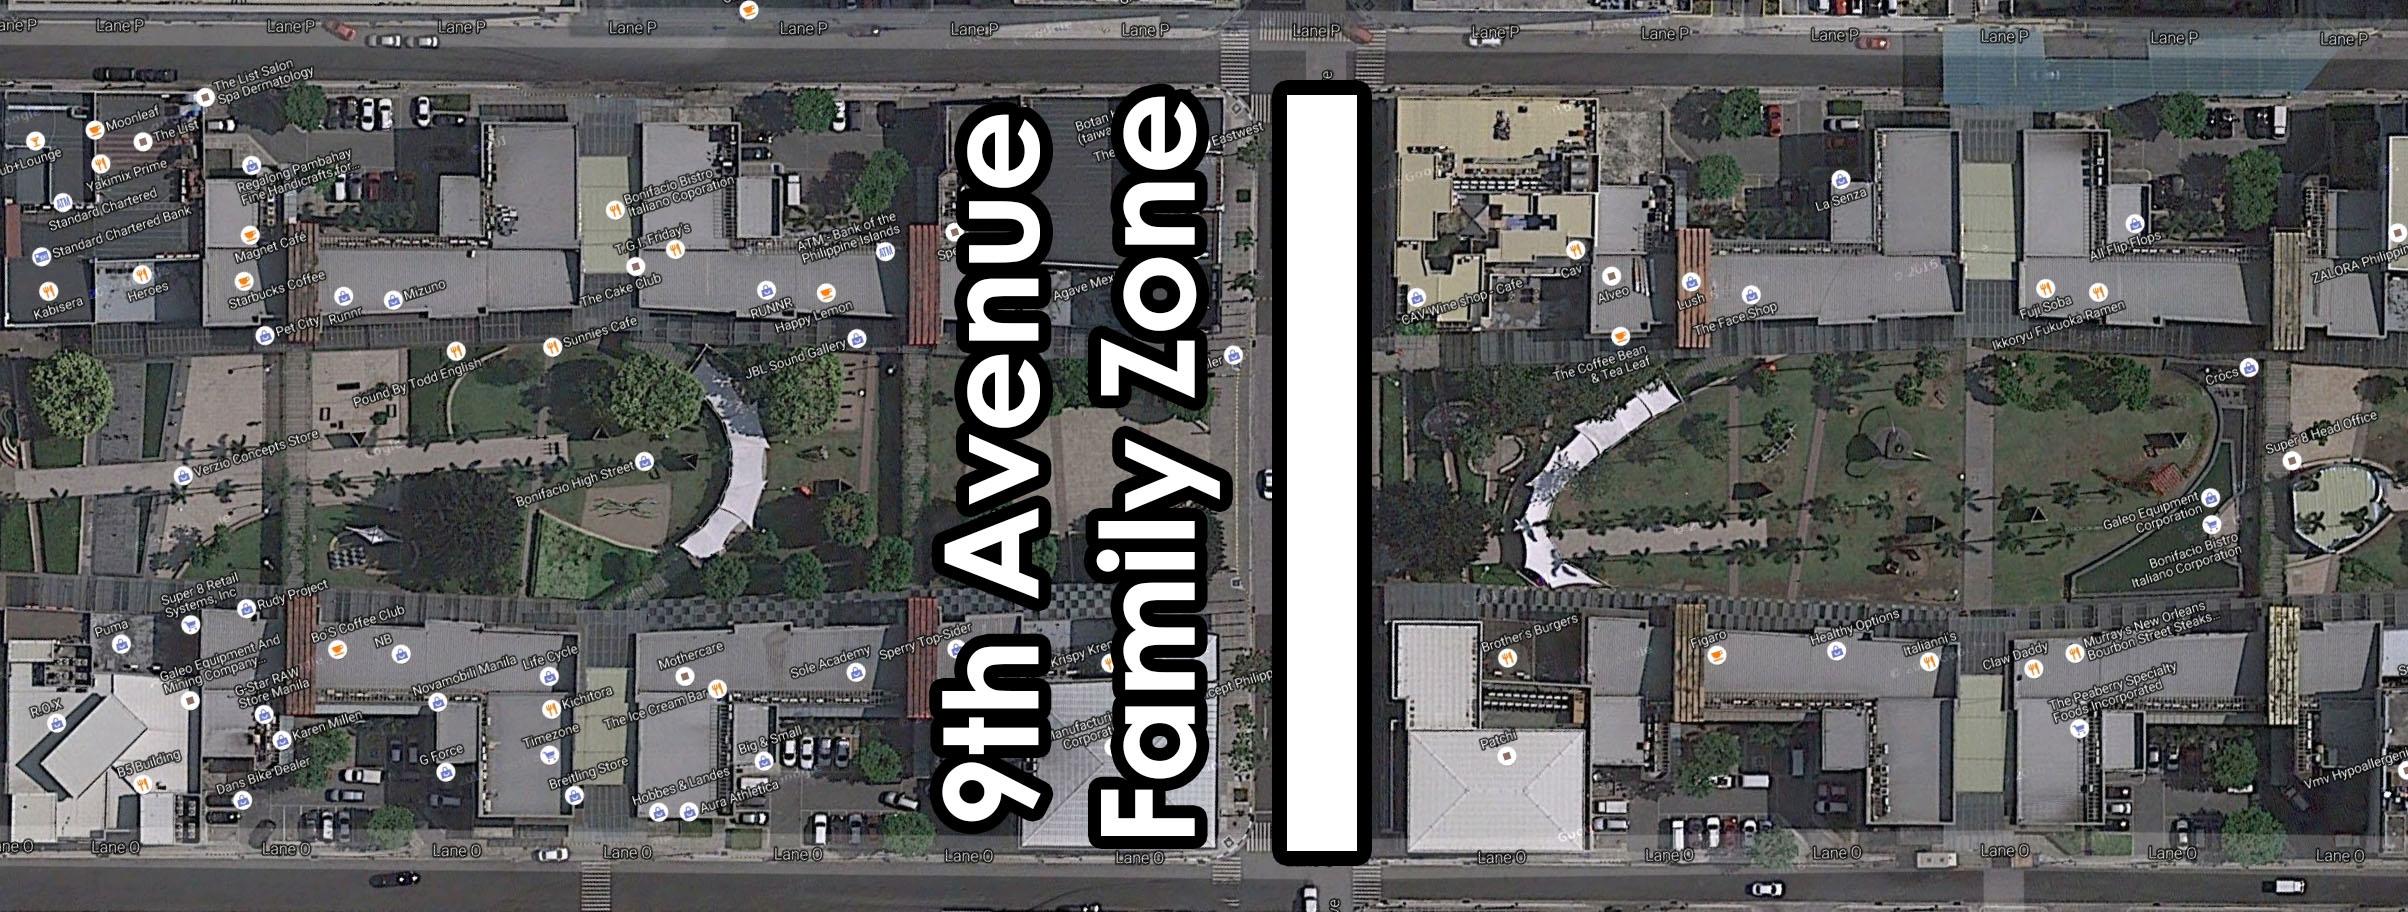 family zone.jpg